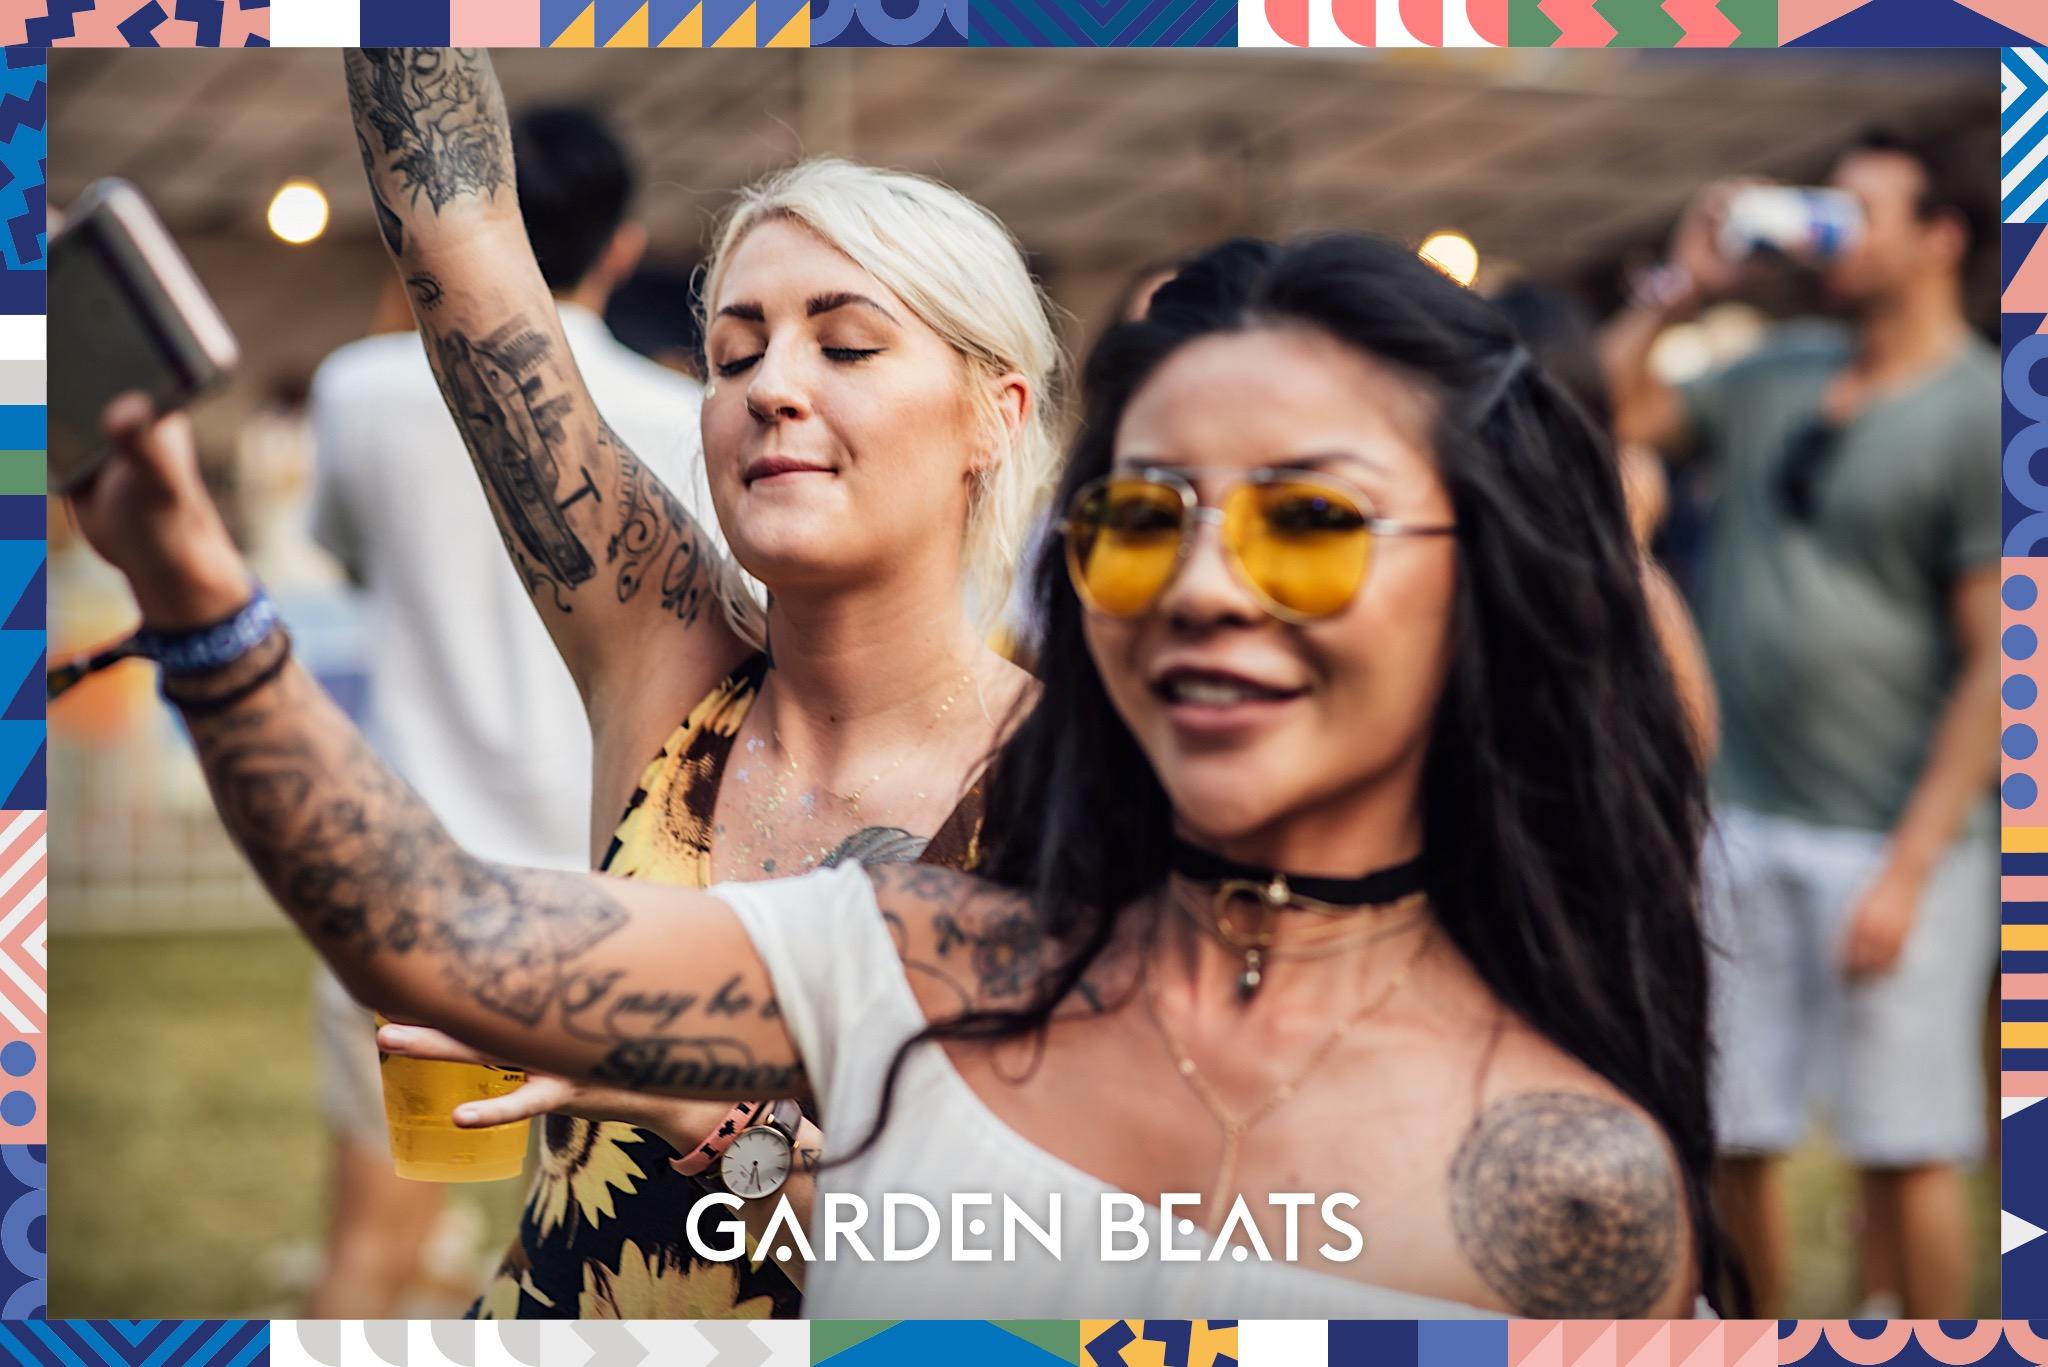 18032017_GardenBeats_Colossal584_WatermarkedGB.jpg